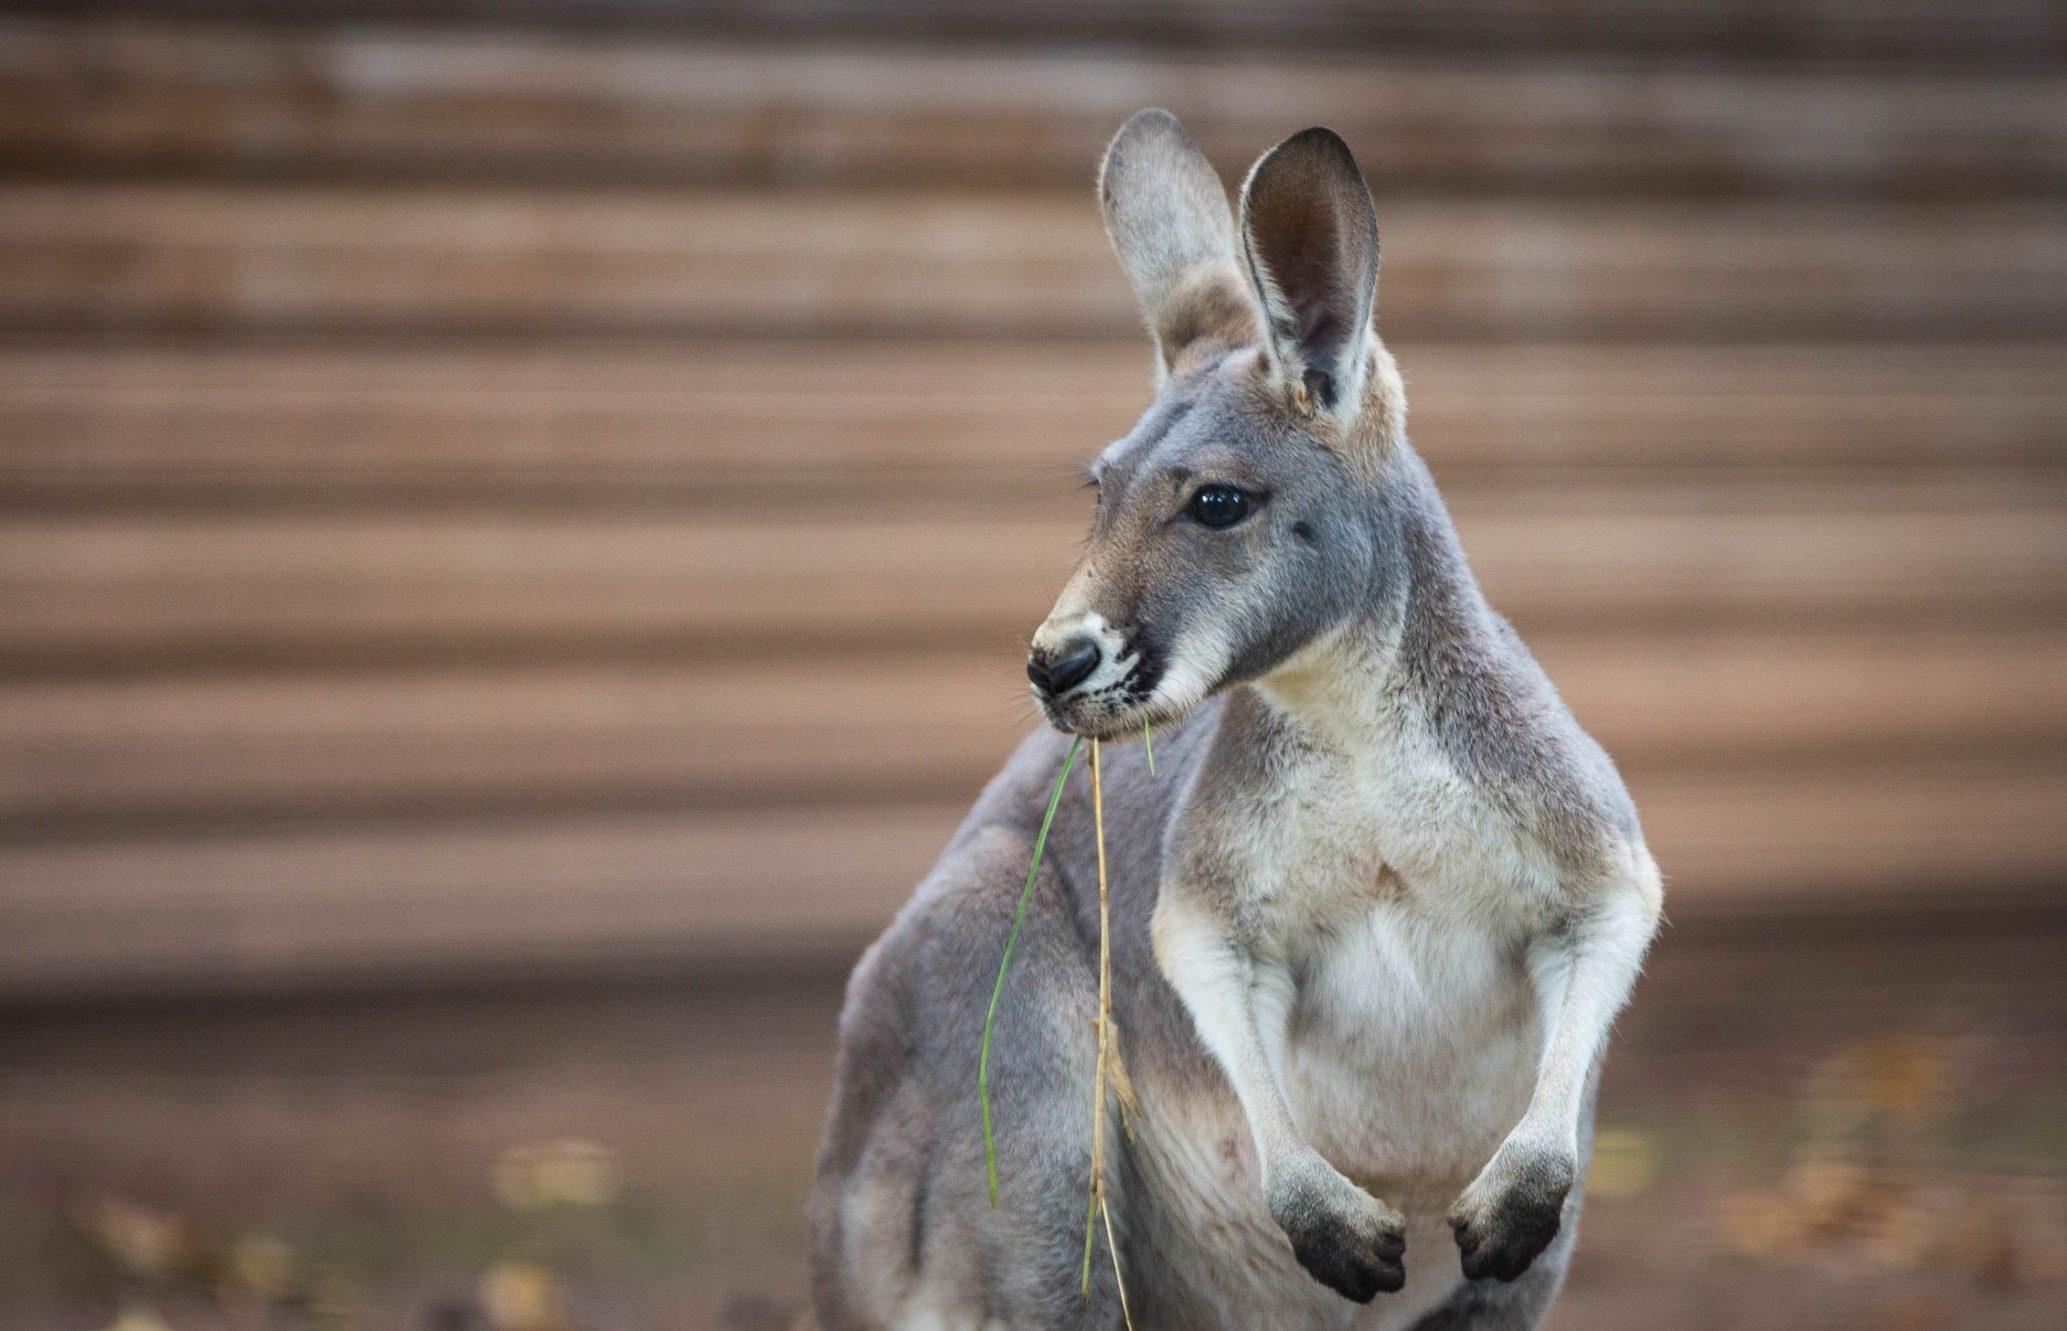 Känguruh im Zoo Dresden. Foto: Sven Ellger